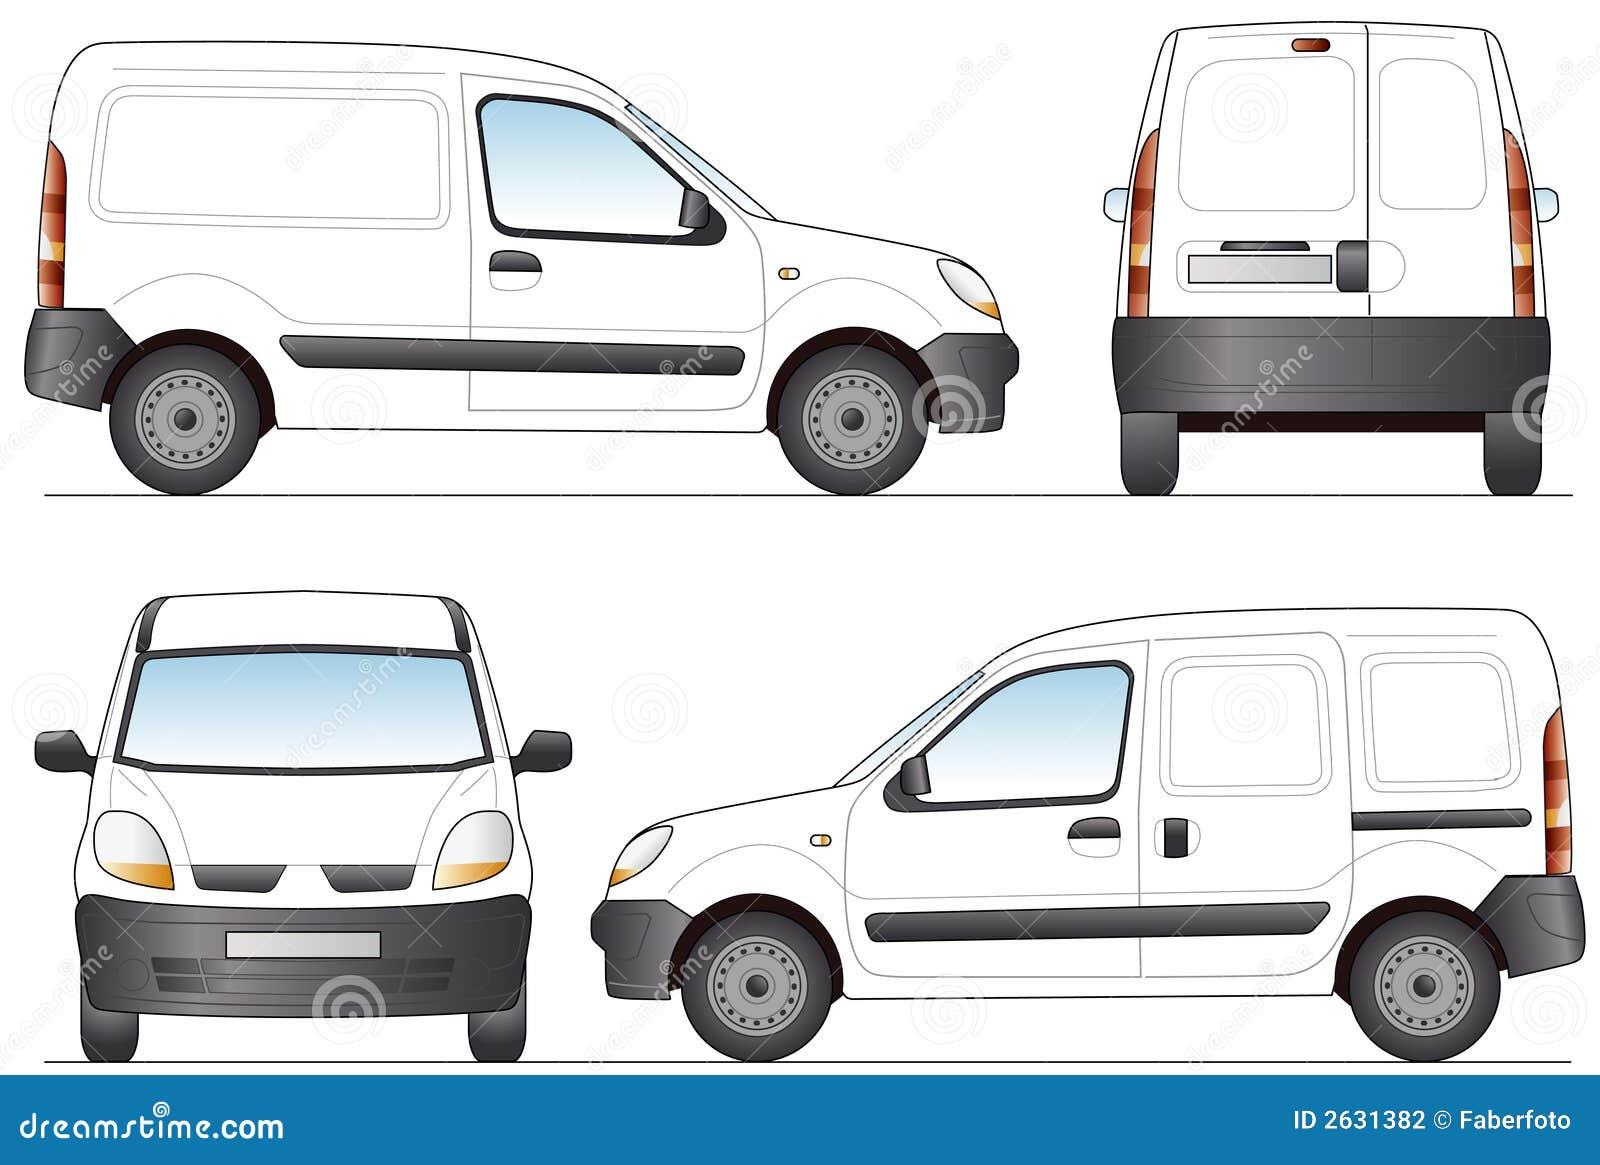 Doblo Xl Food Truck